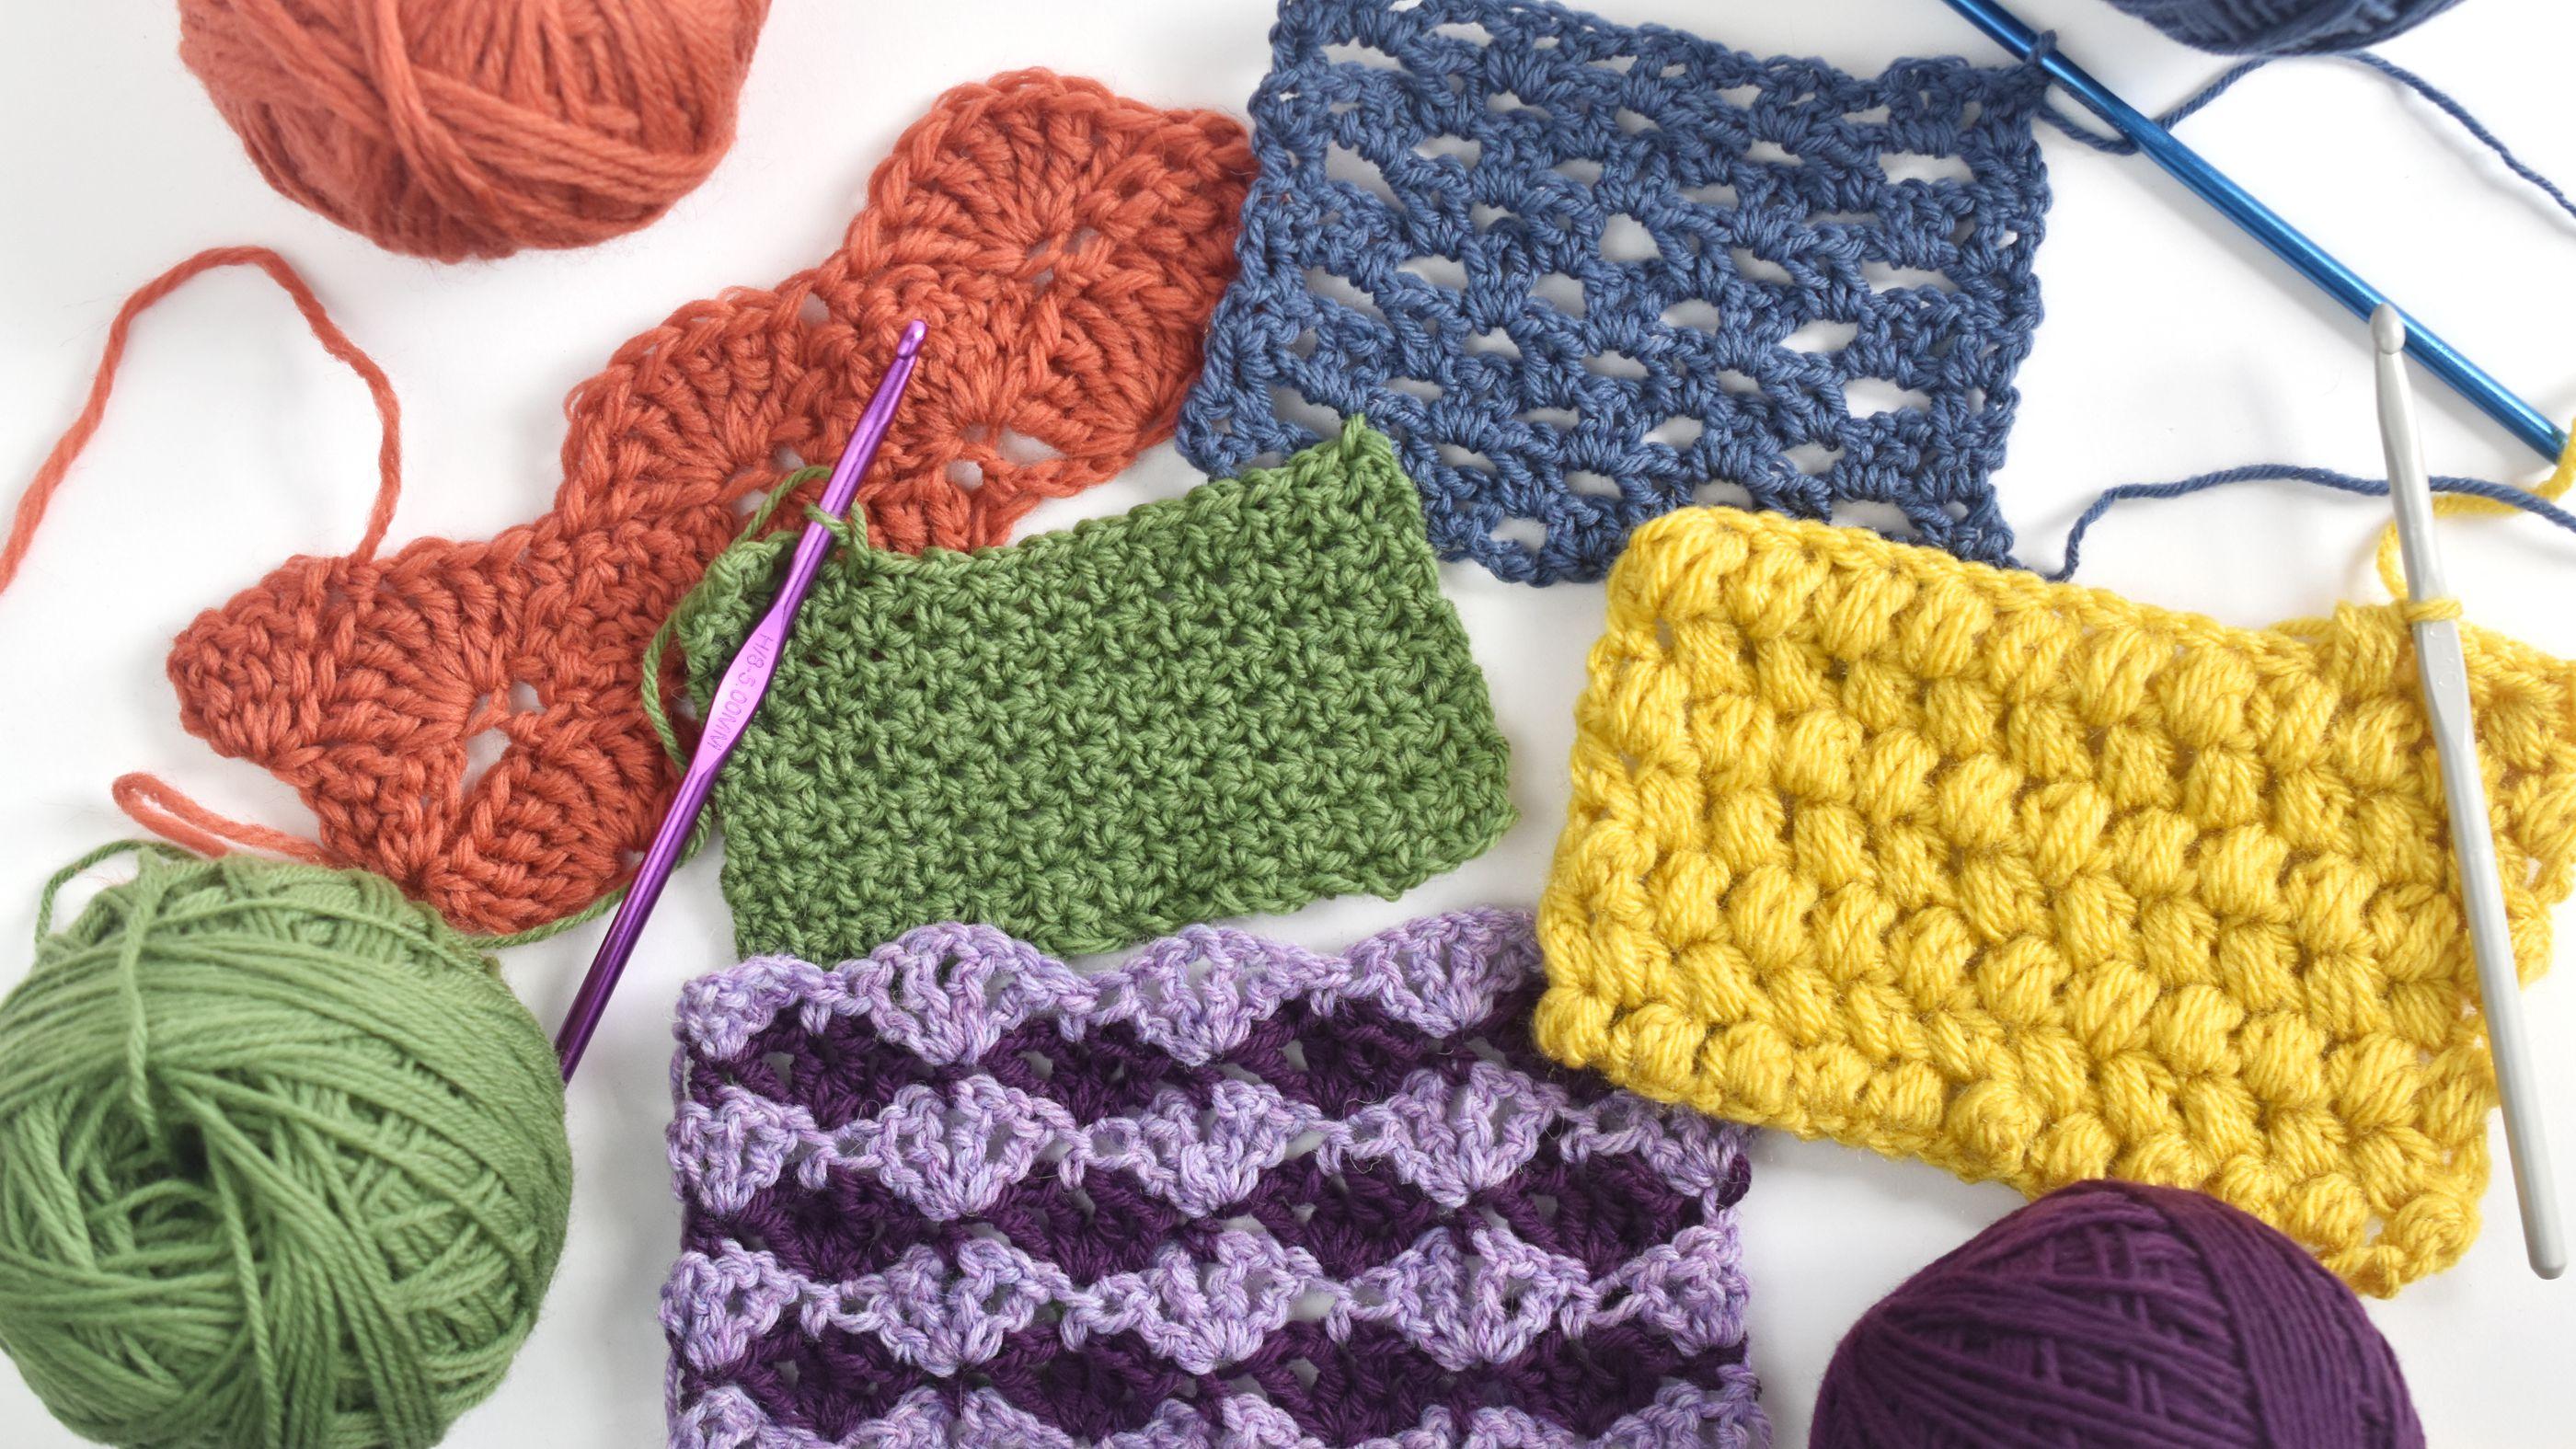 CrochetStitchPatterns 5bce2263c9e77c00513ffbb7